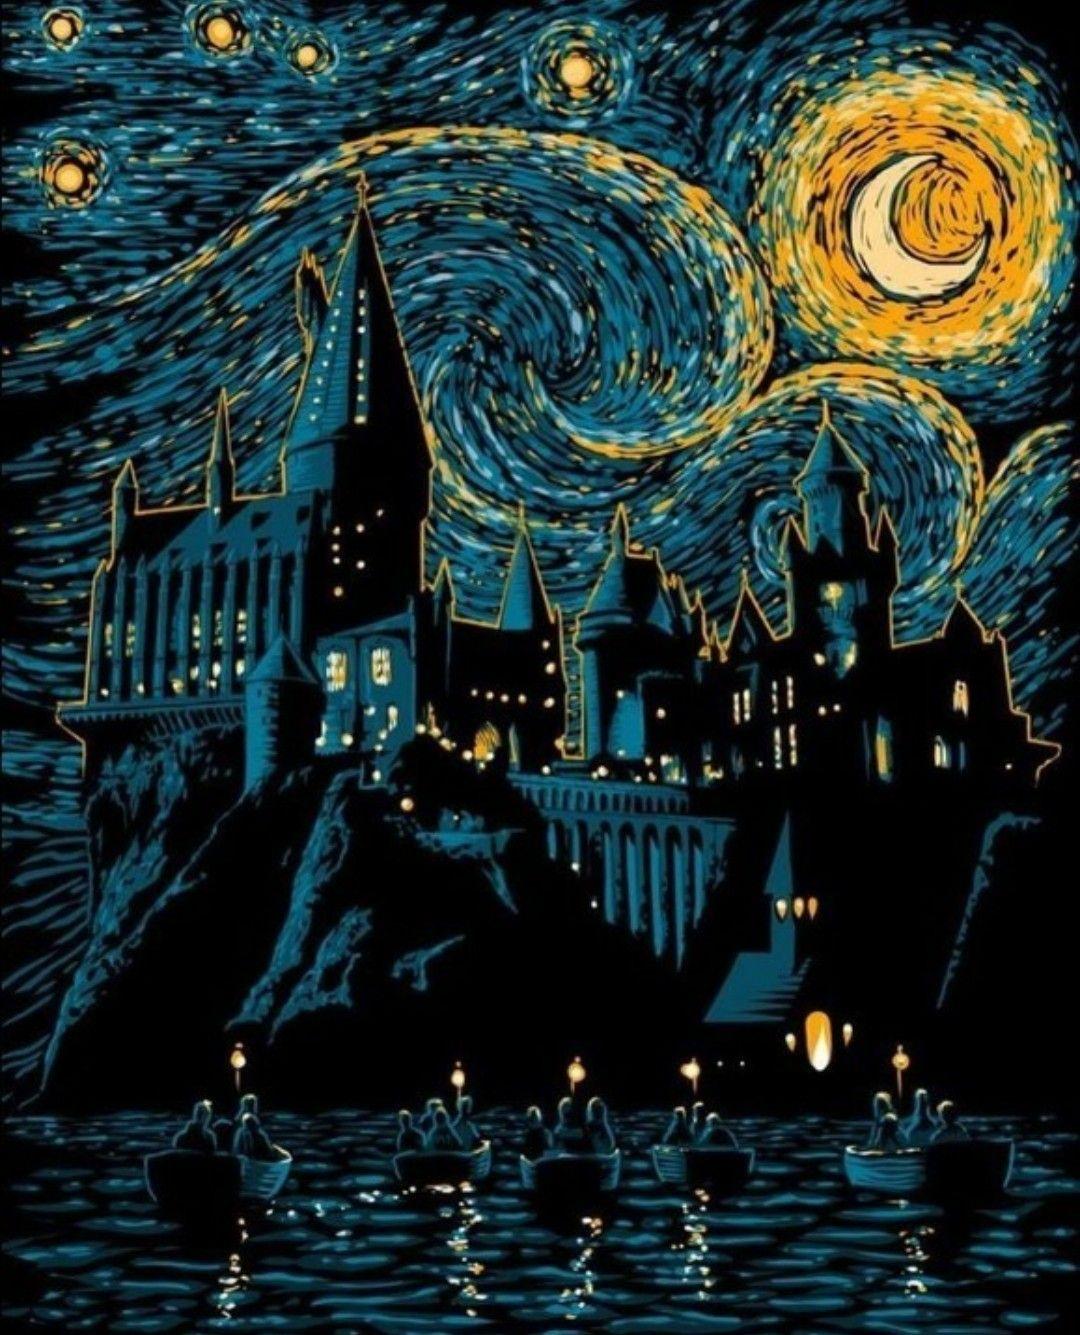 Wallpaper Harry Potter Hogwarts Van Gogh Noite Estrelada